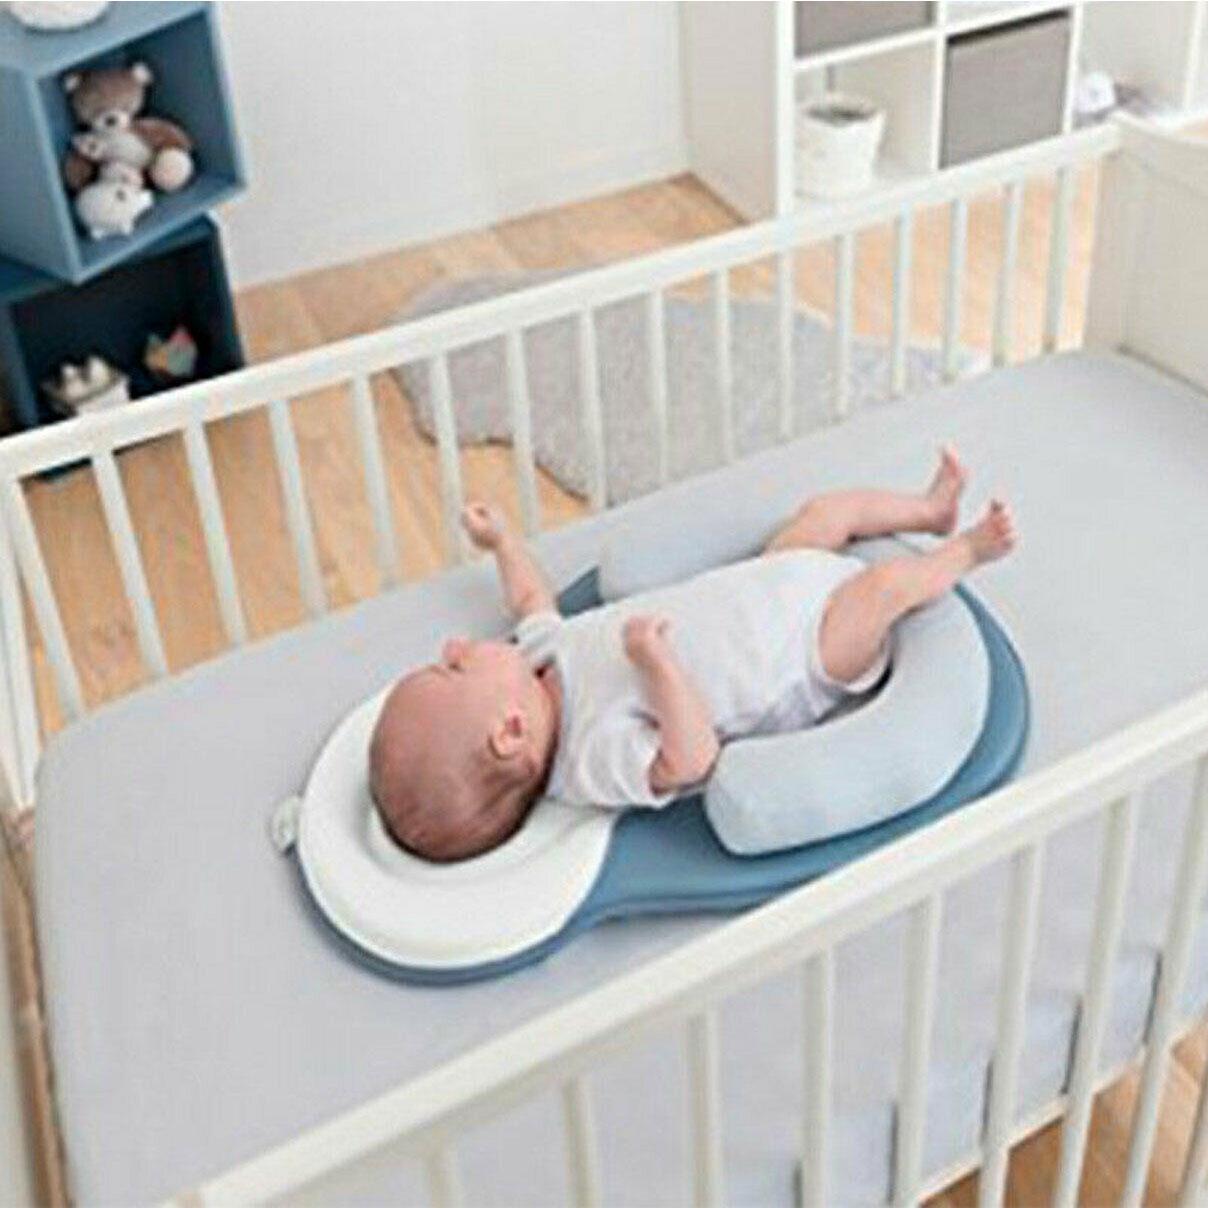 Cradle Crestell Standard Cotton Filled Waterproof Boori Bassinet Protector